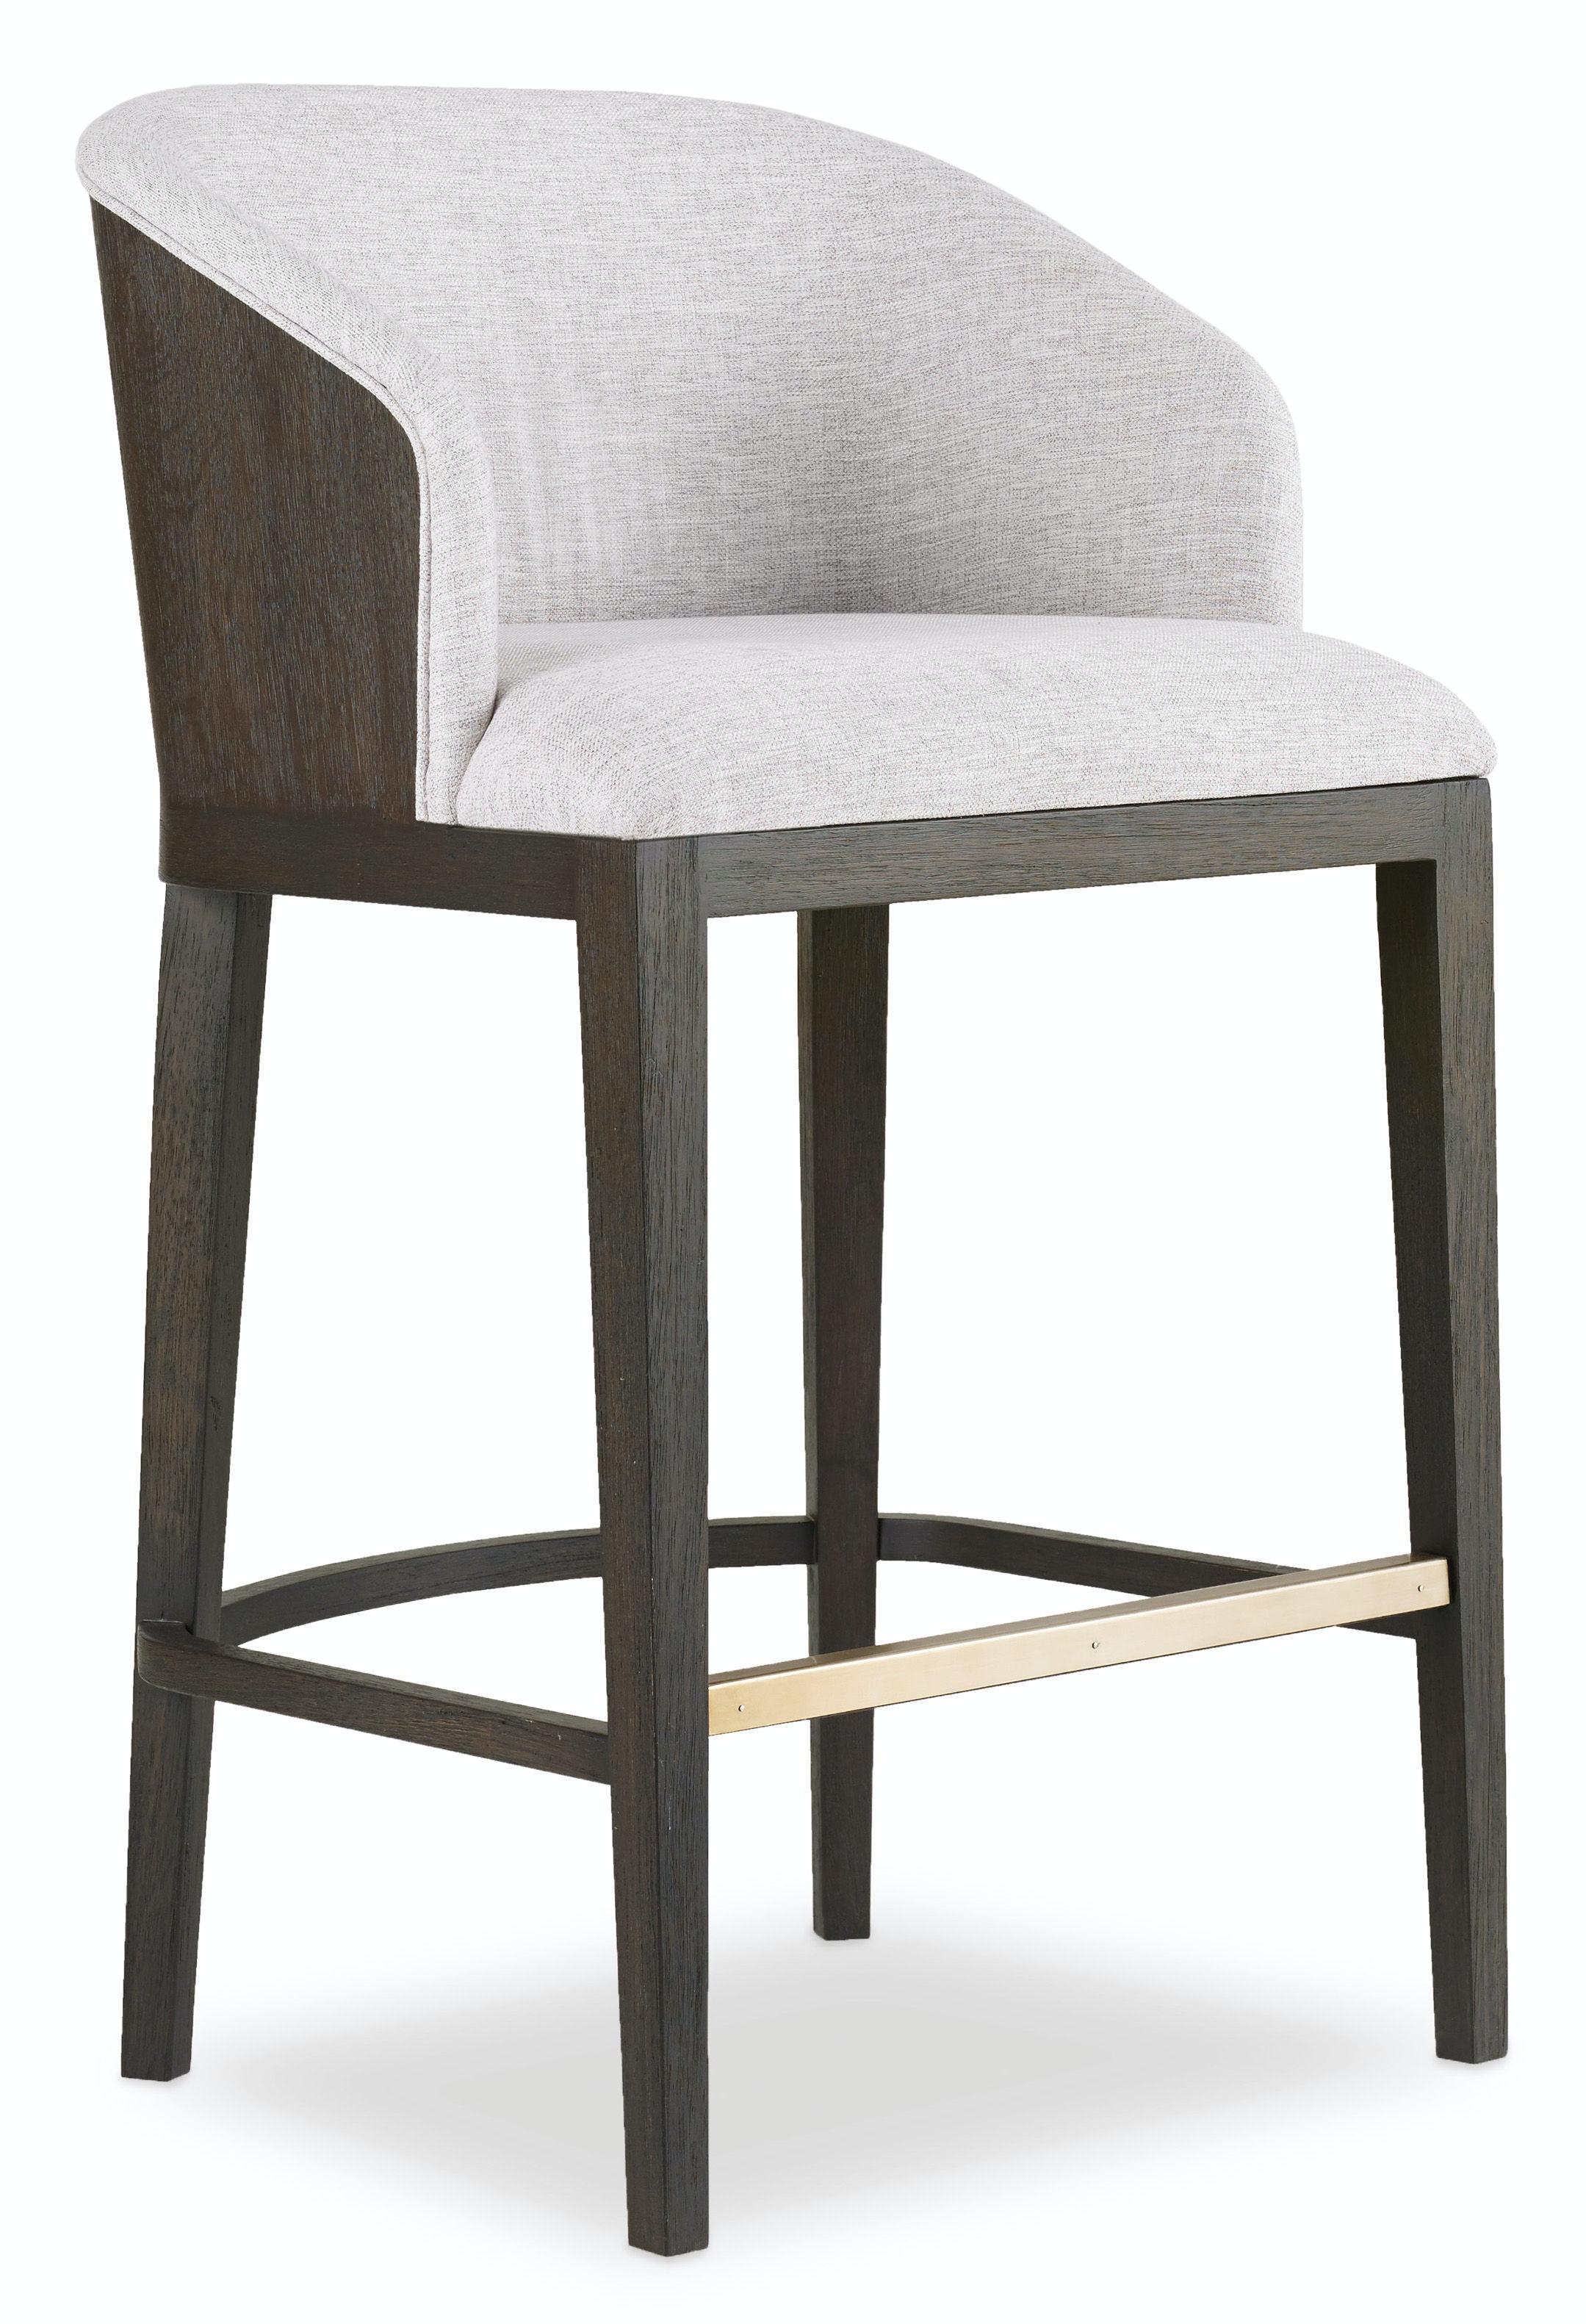 Hooker Furniture Curata Upholstered Bar Stool 1600 20860 DKW